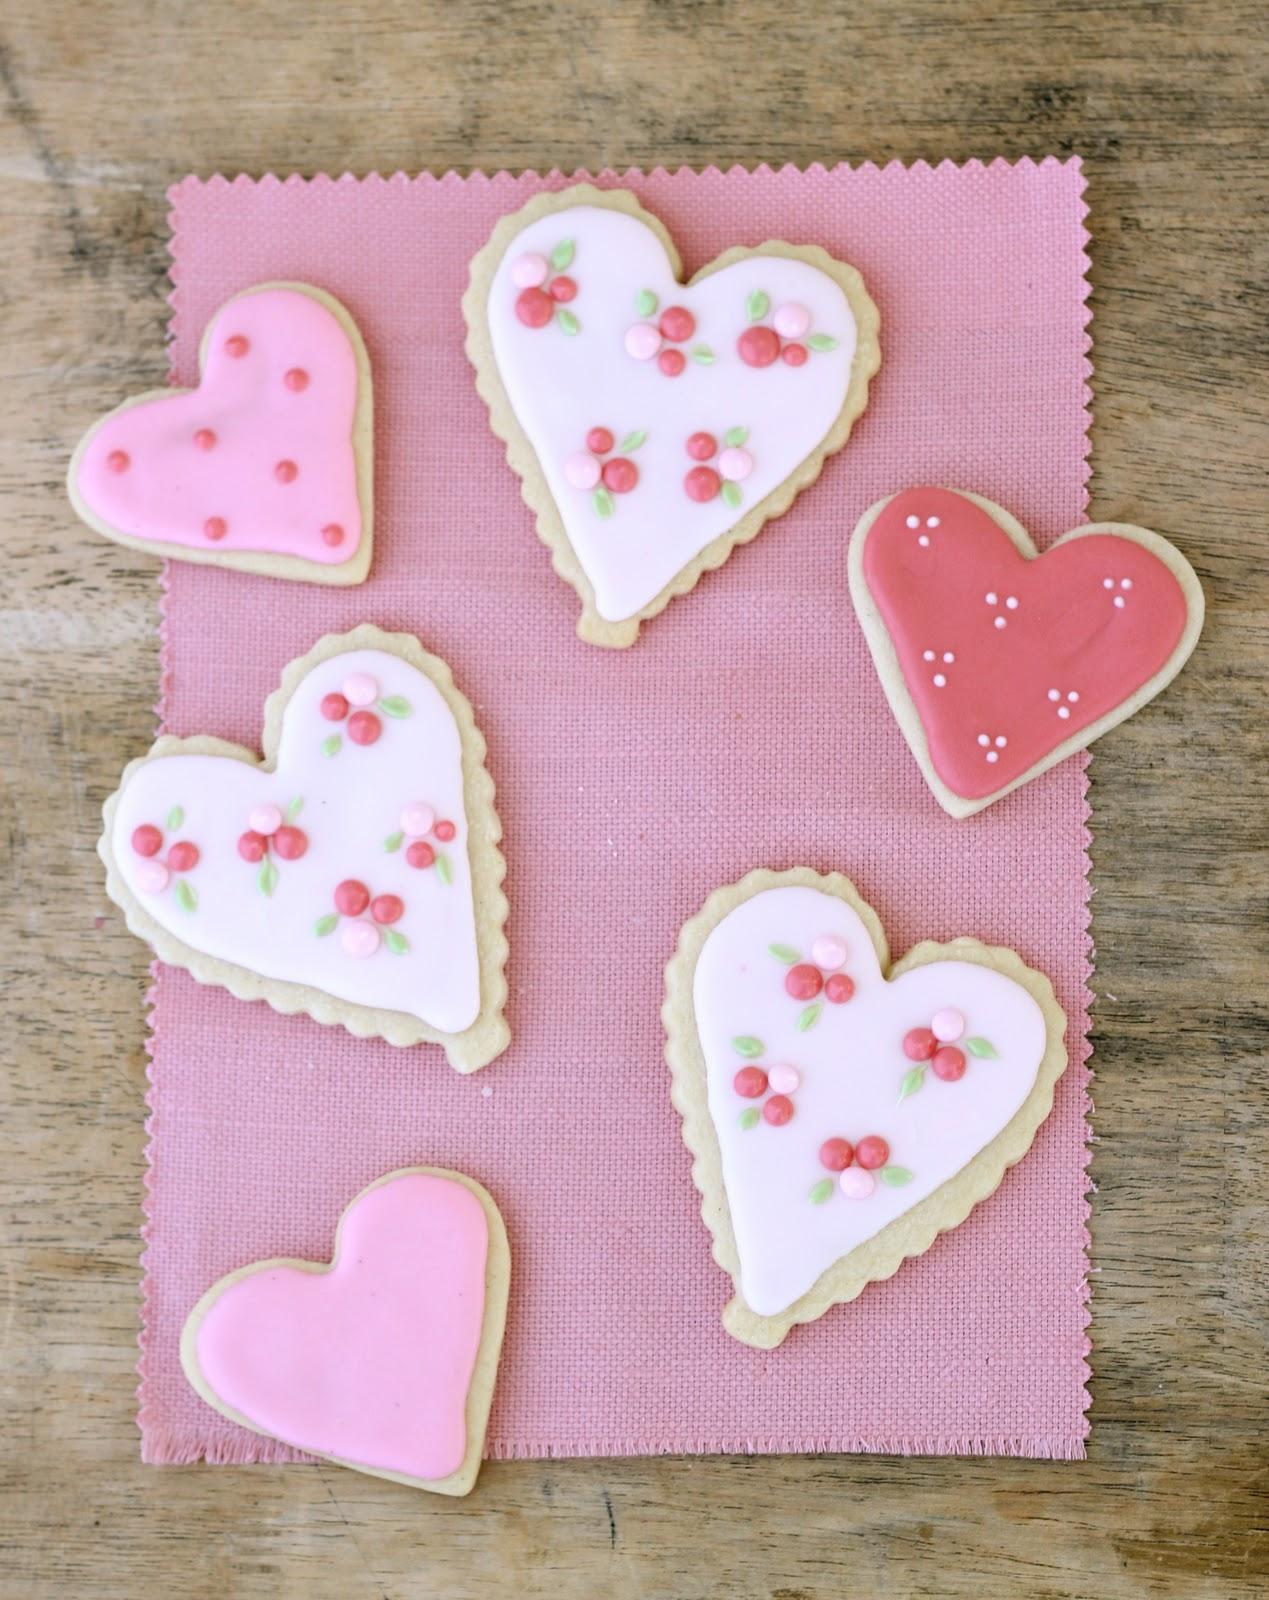 Valentineu0027s Day Sugar Cookies | Heart Cookies For Emmau0027s Baptism